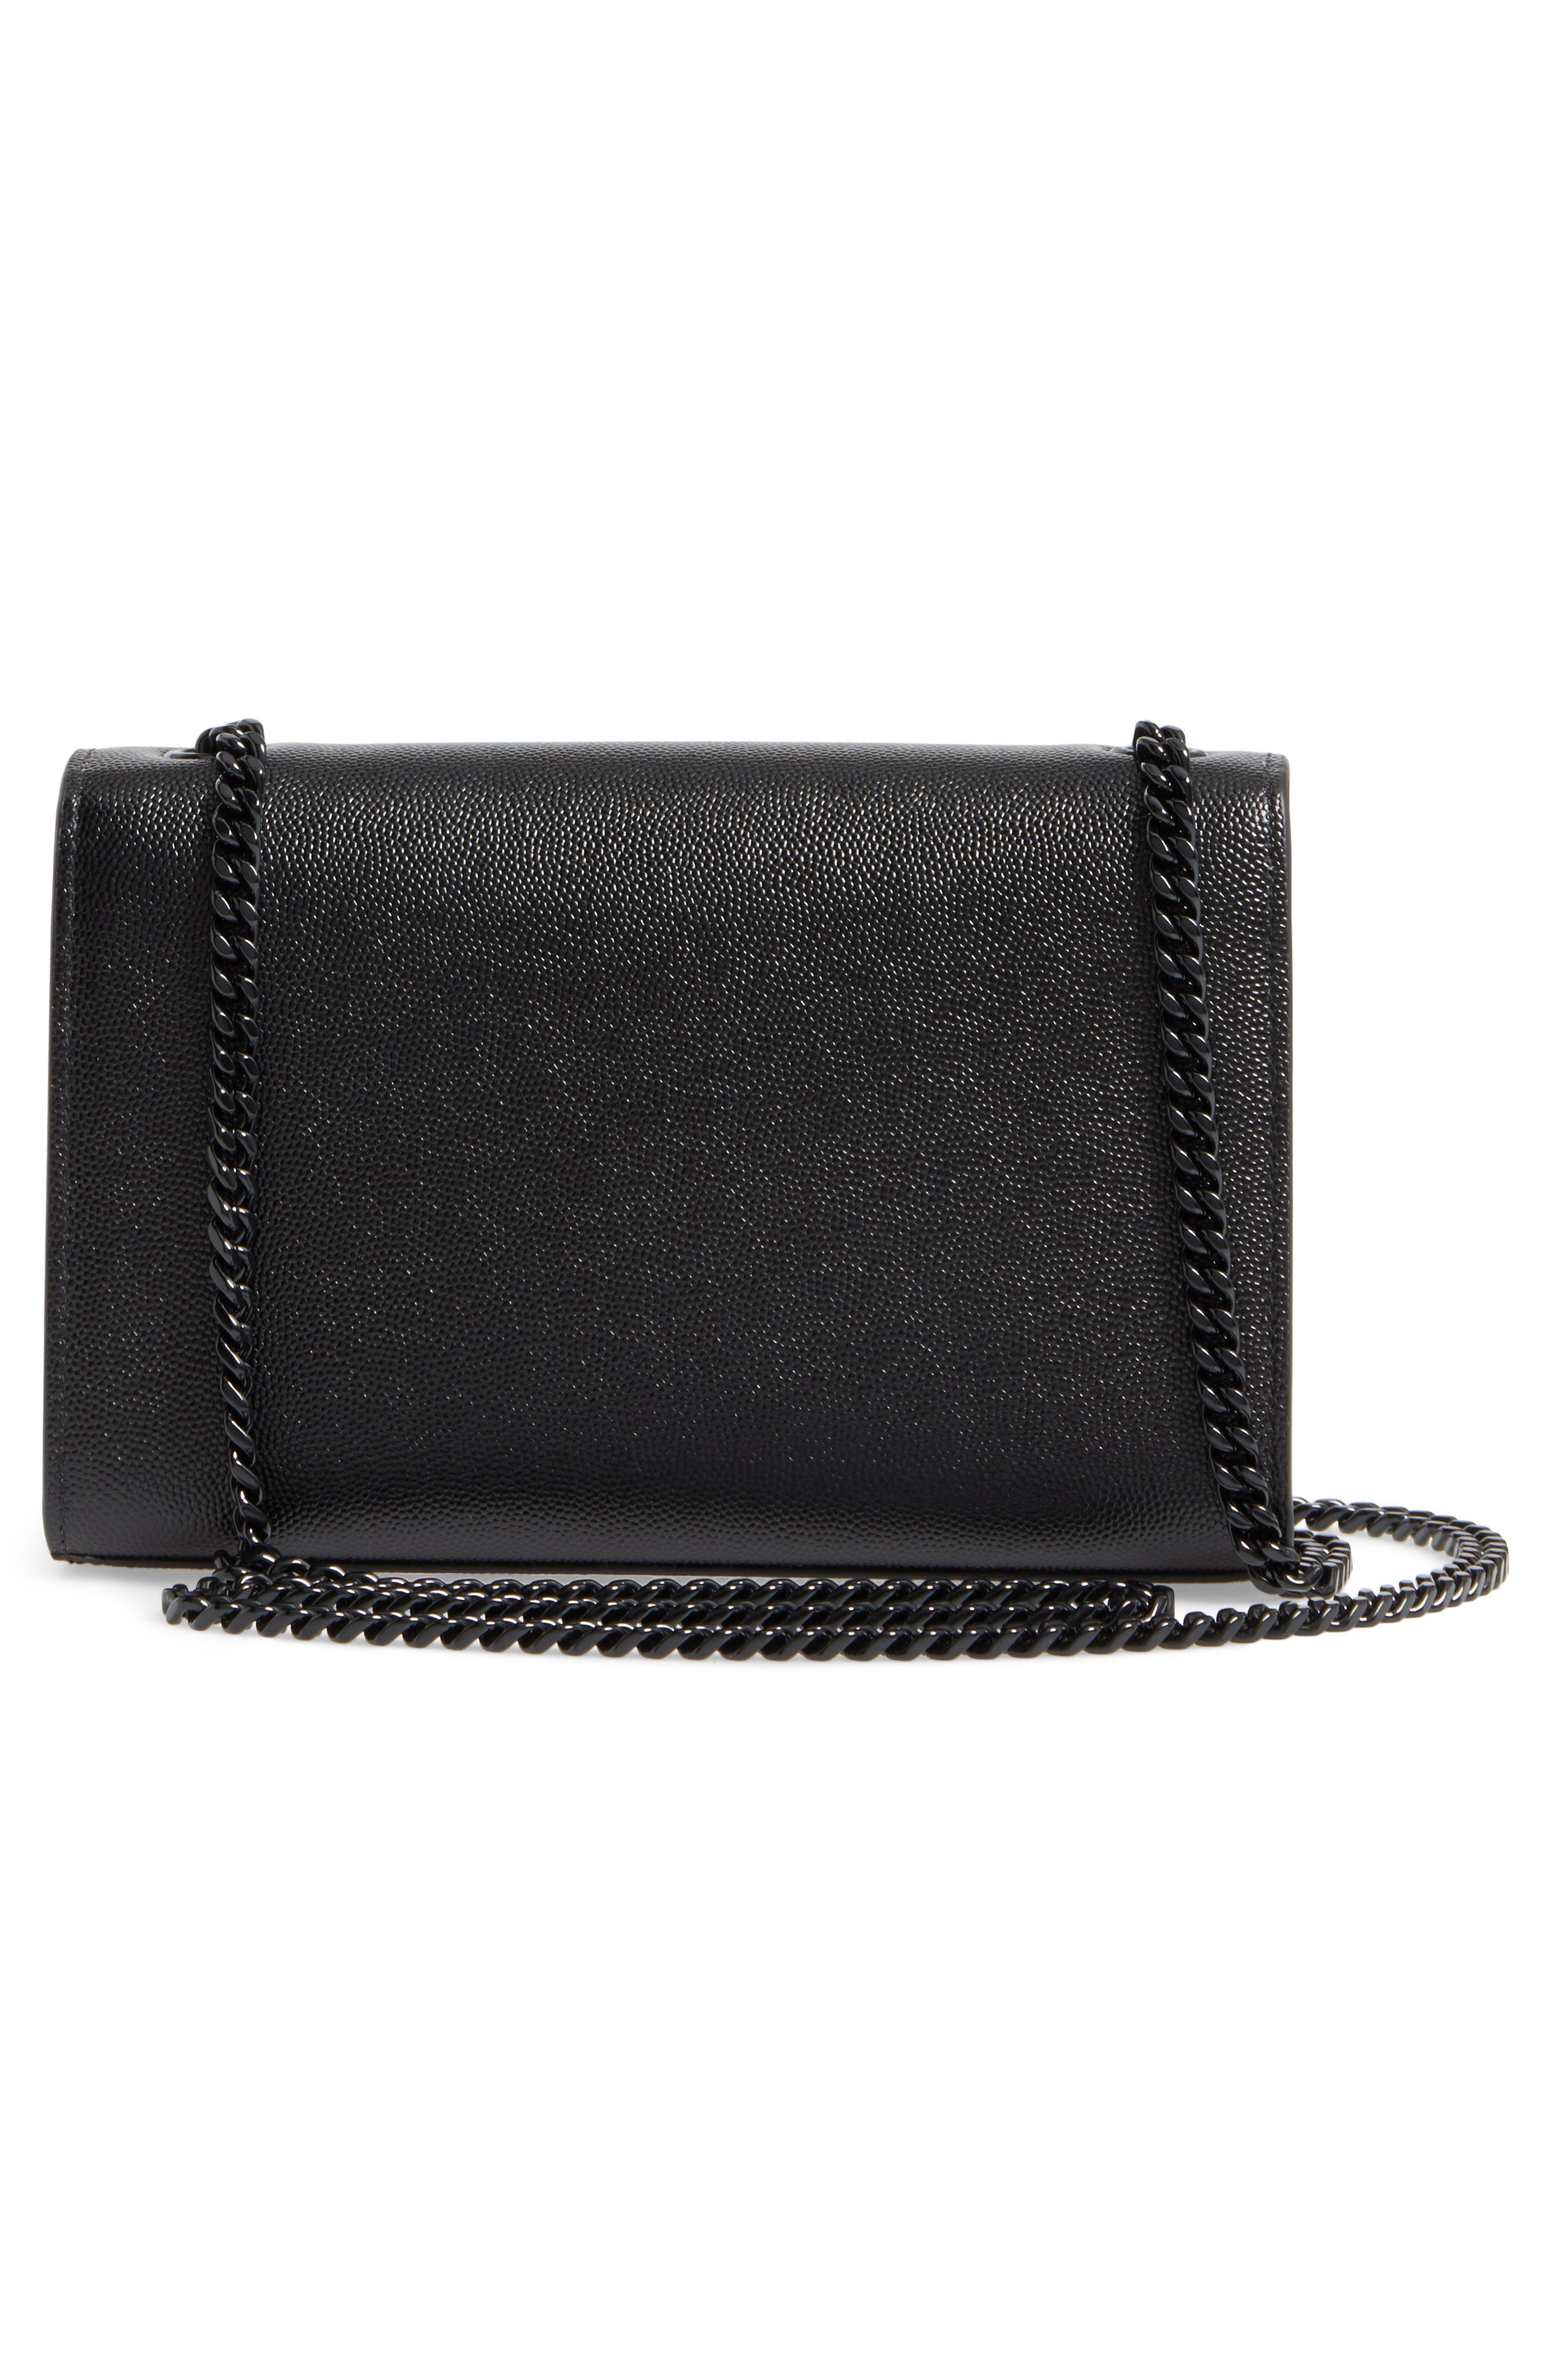 Small Kate Leather Shoulder Bag,                             Alternate thumbnail 3, color,                             BLACK